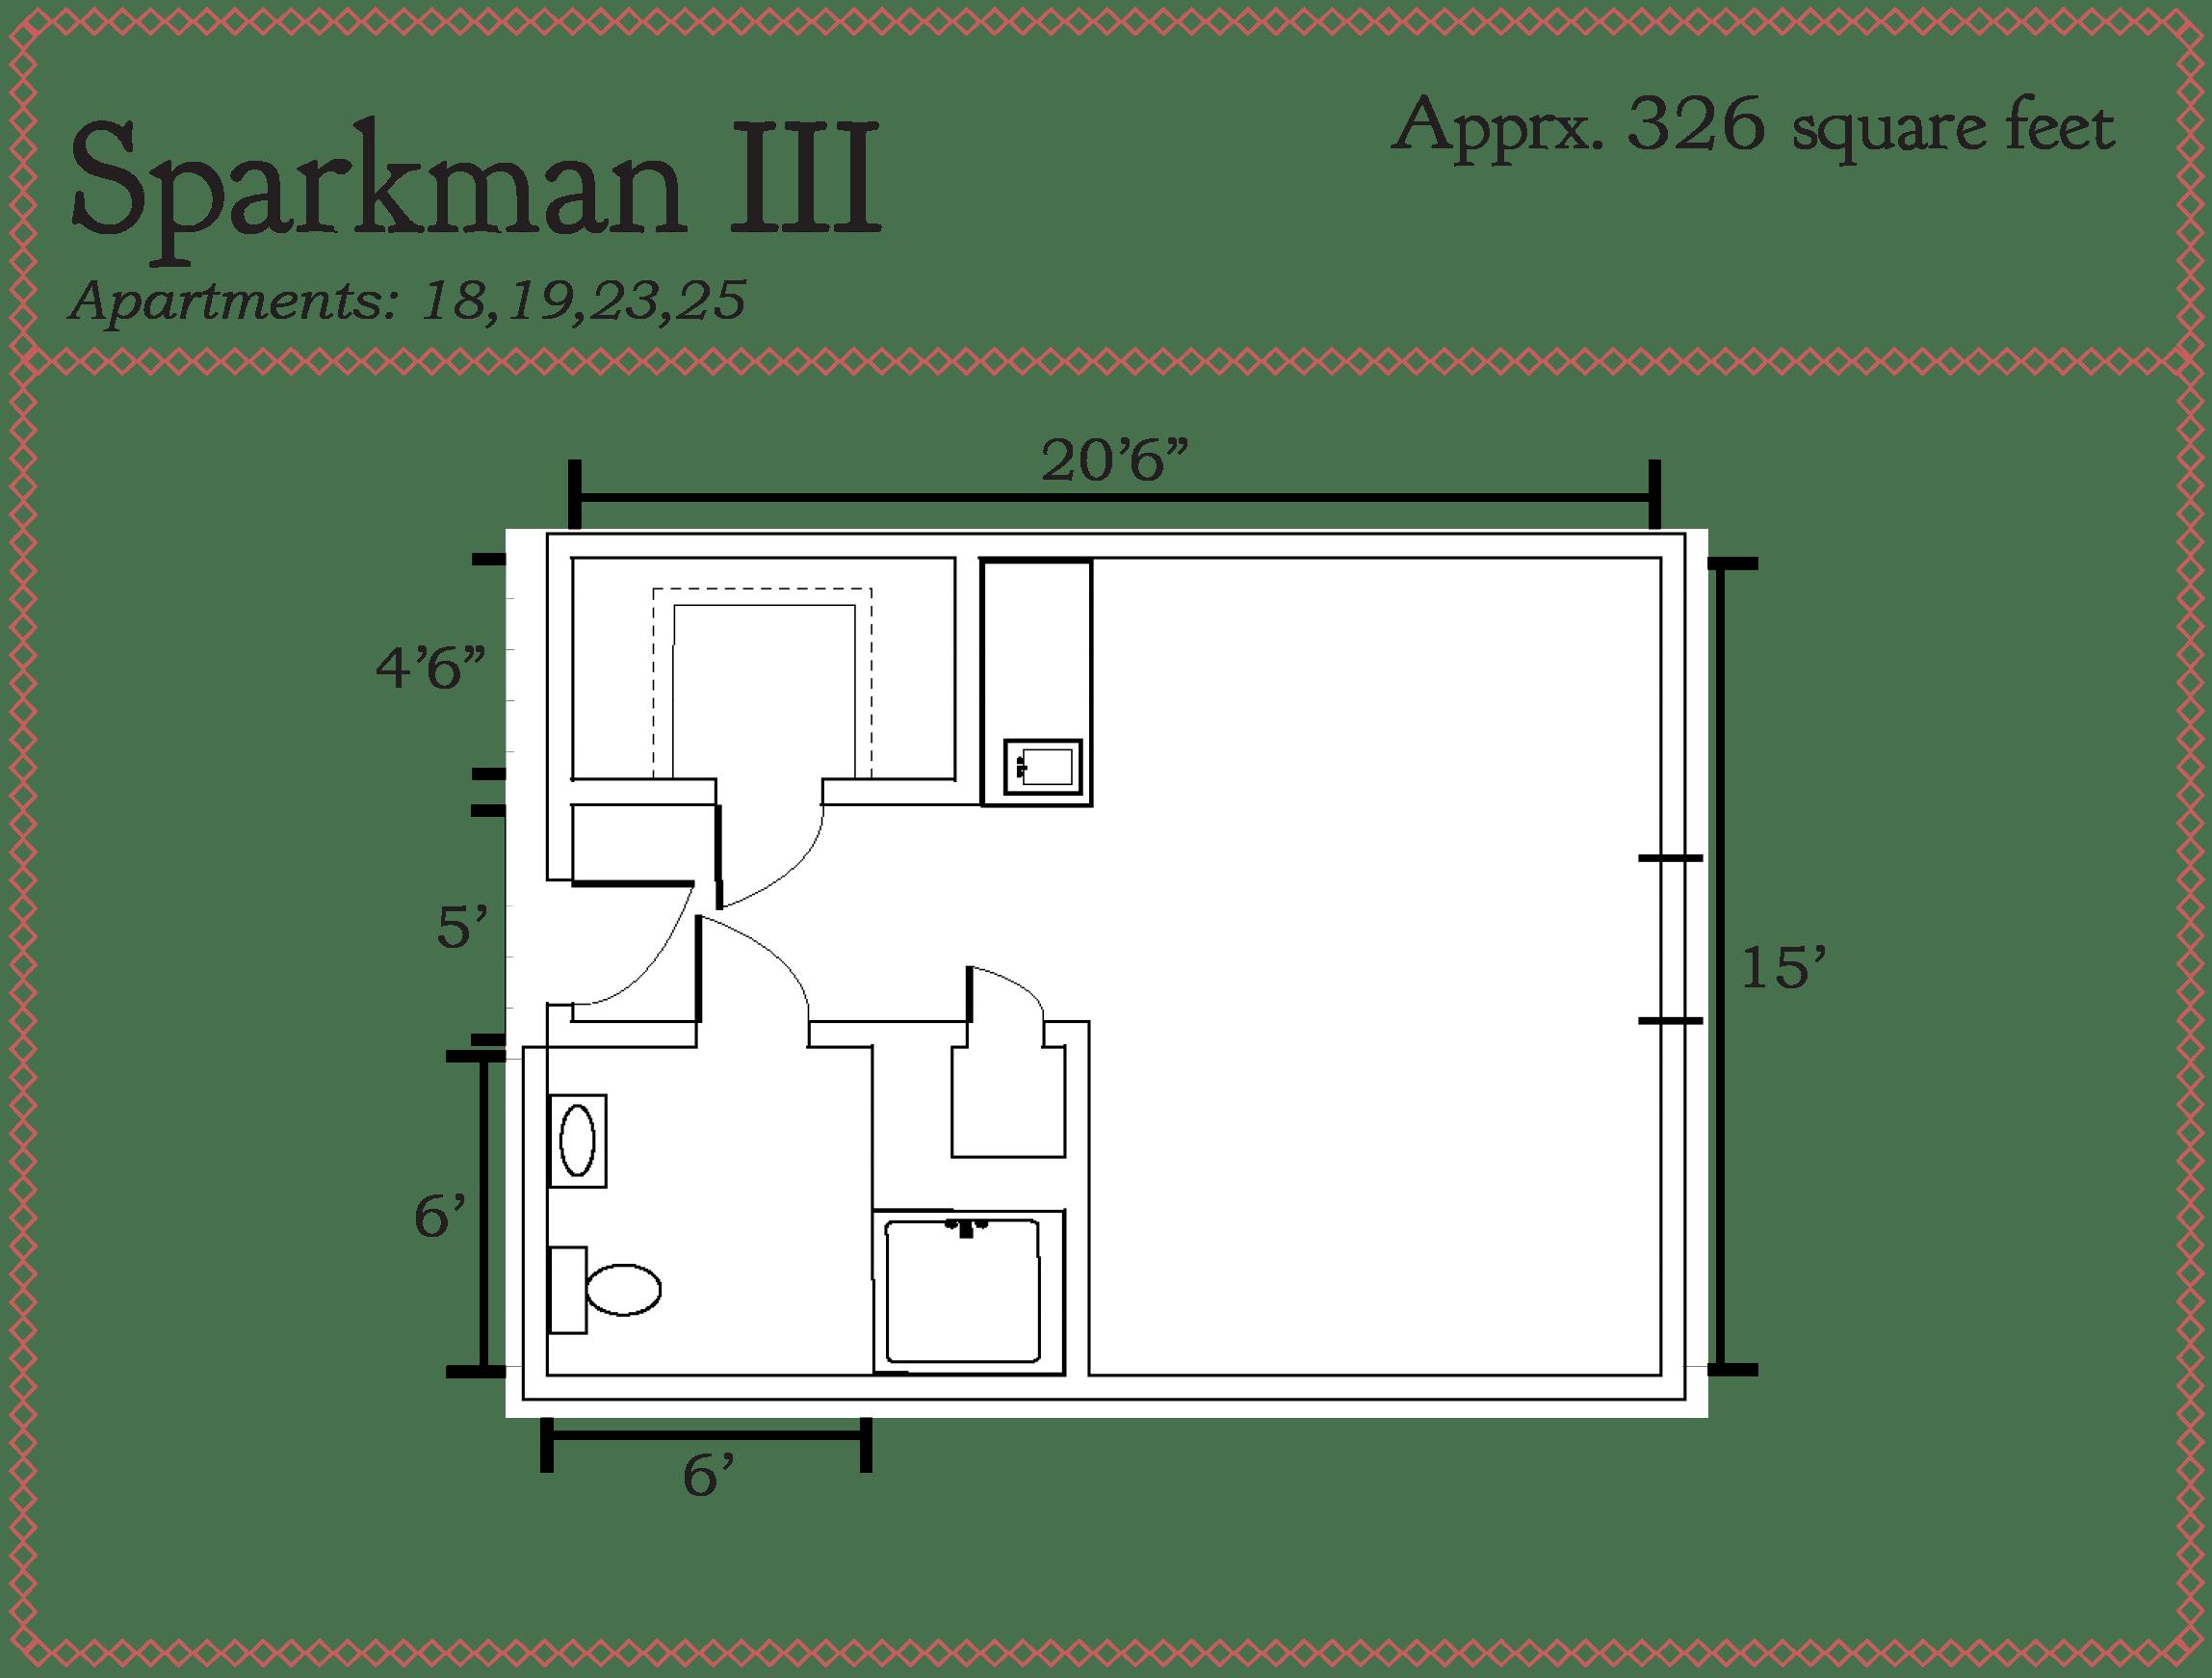 Sparkman III